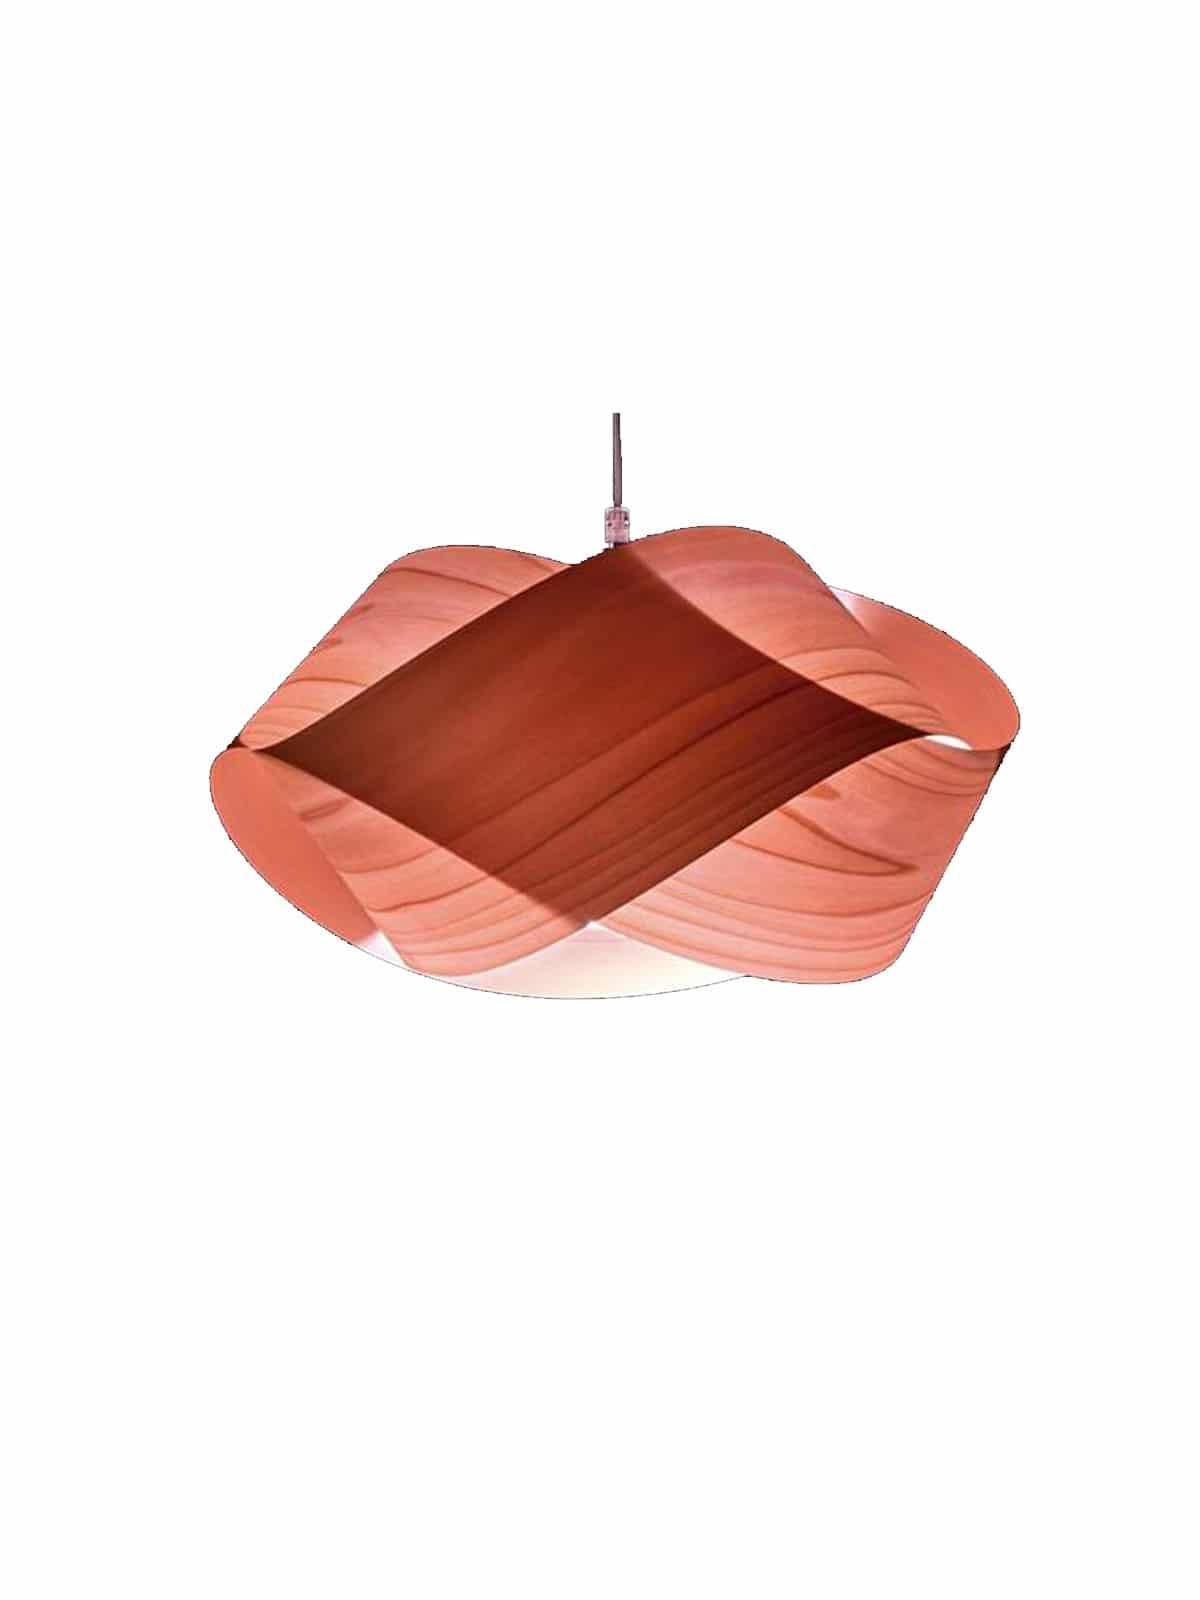 NEU Holzlampe Nut in pink